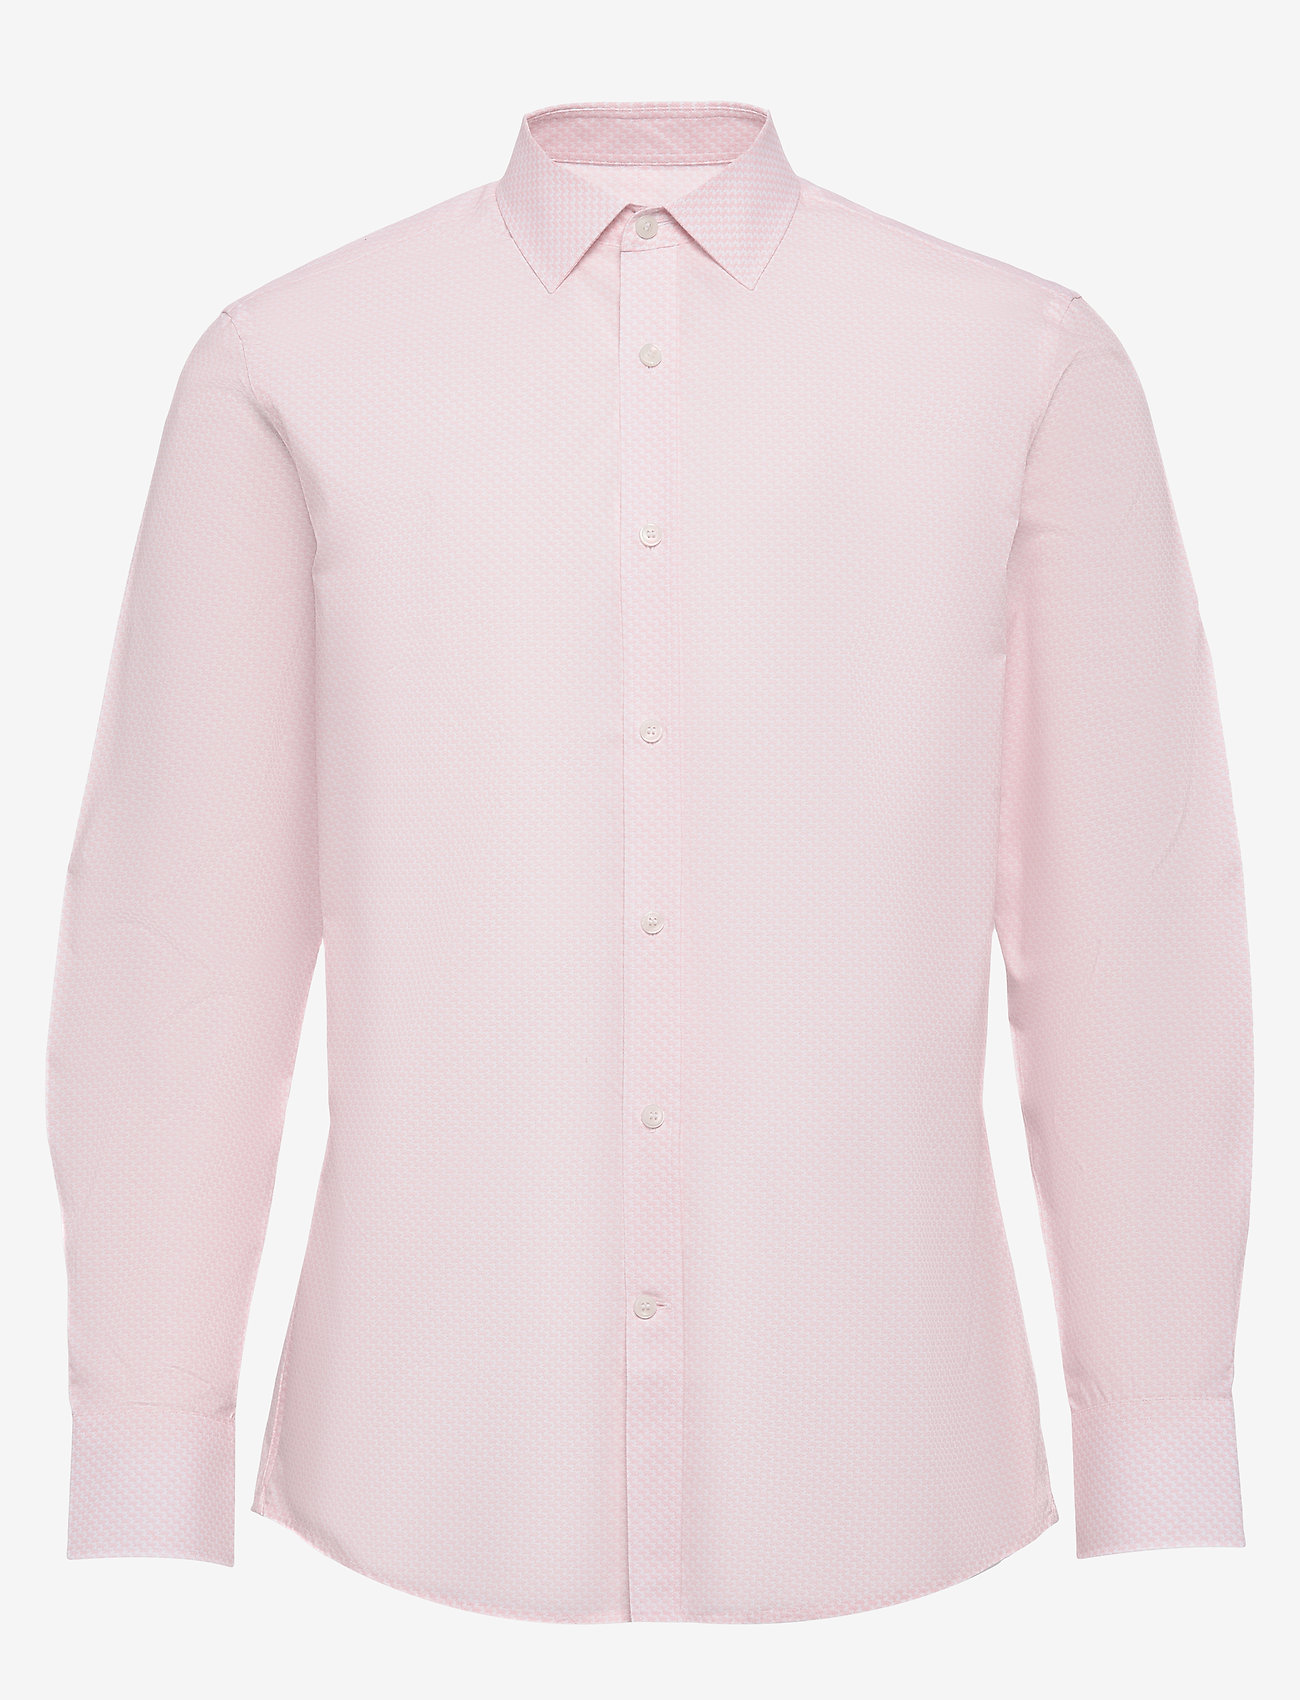 Tiger of Sweden - FRIDOLF - basic skjorter - powder pink - 0